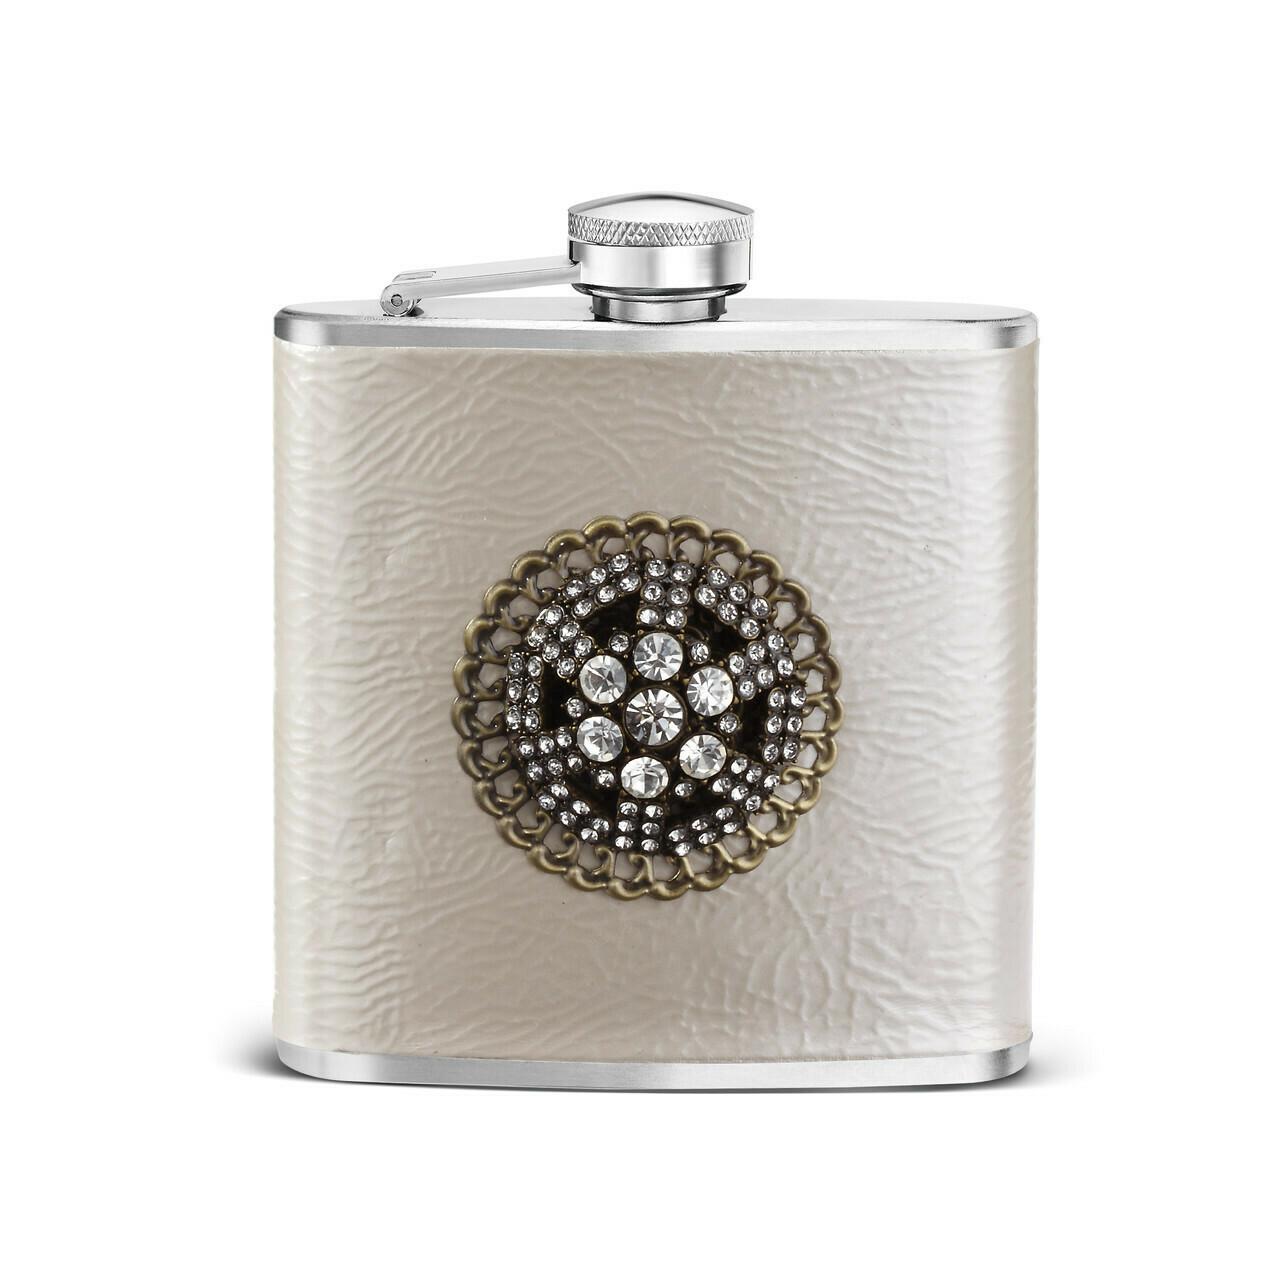 Embellished Flask by Demdaco